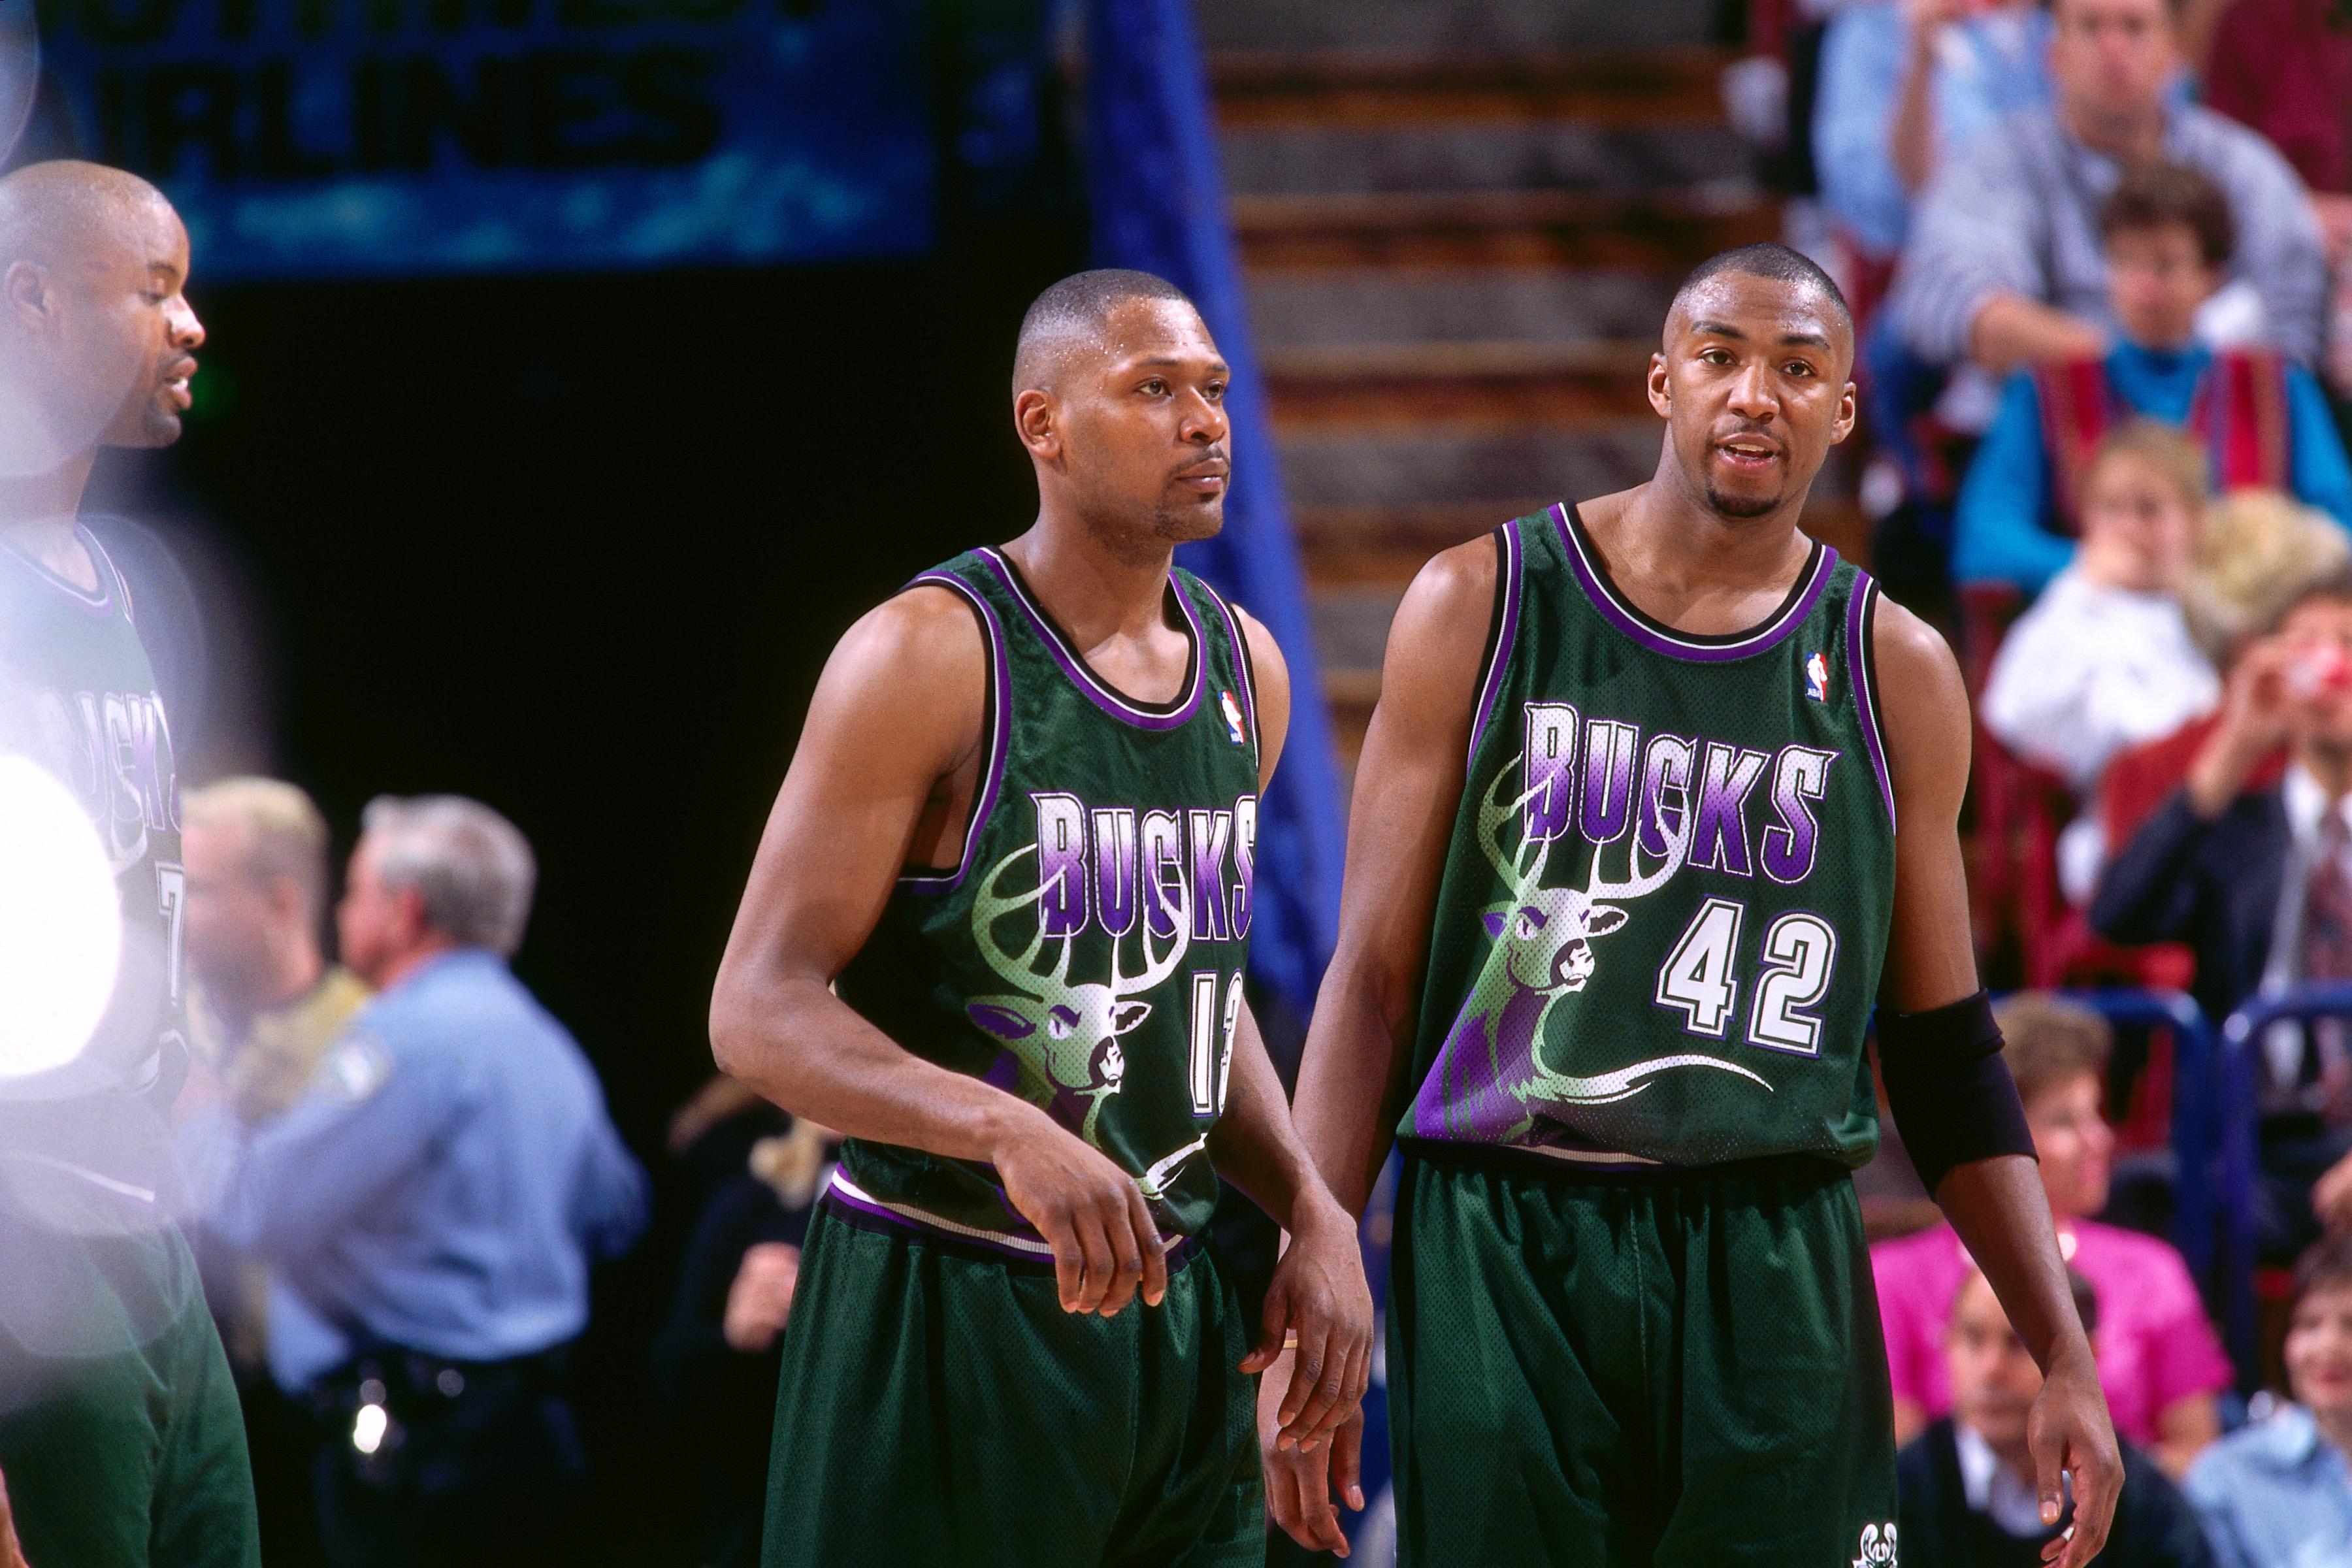 Milwaukee Bucks 49 Years In 49 Days 1995 96 Season